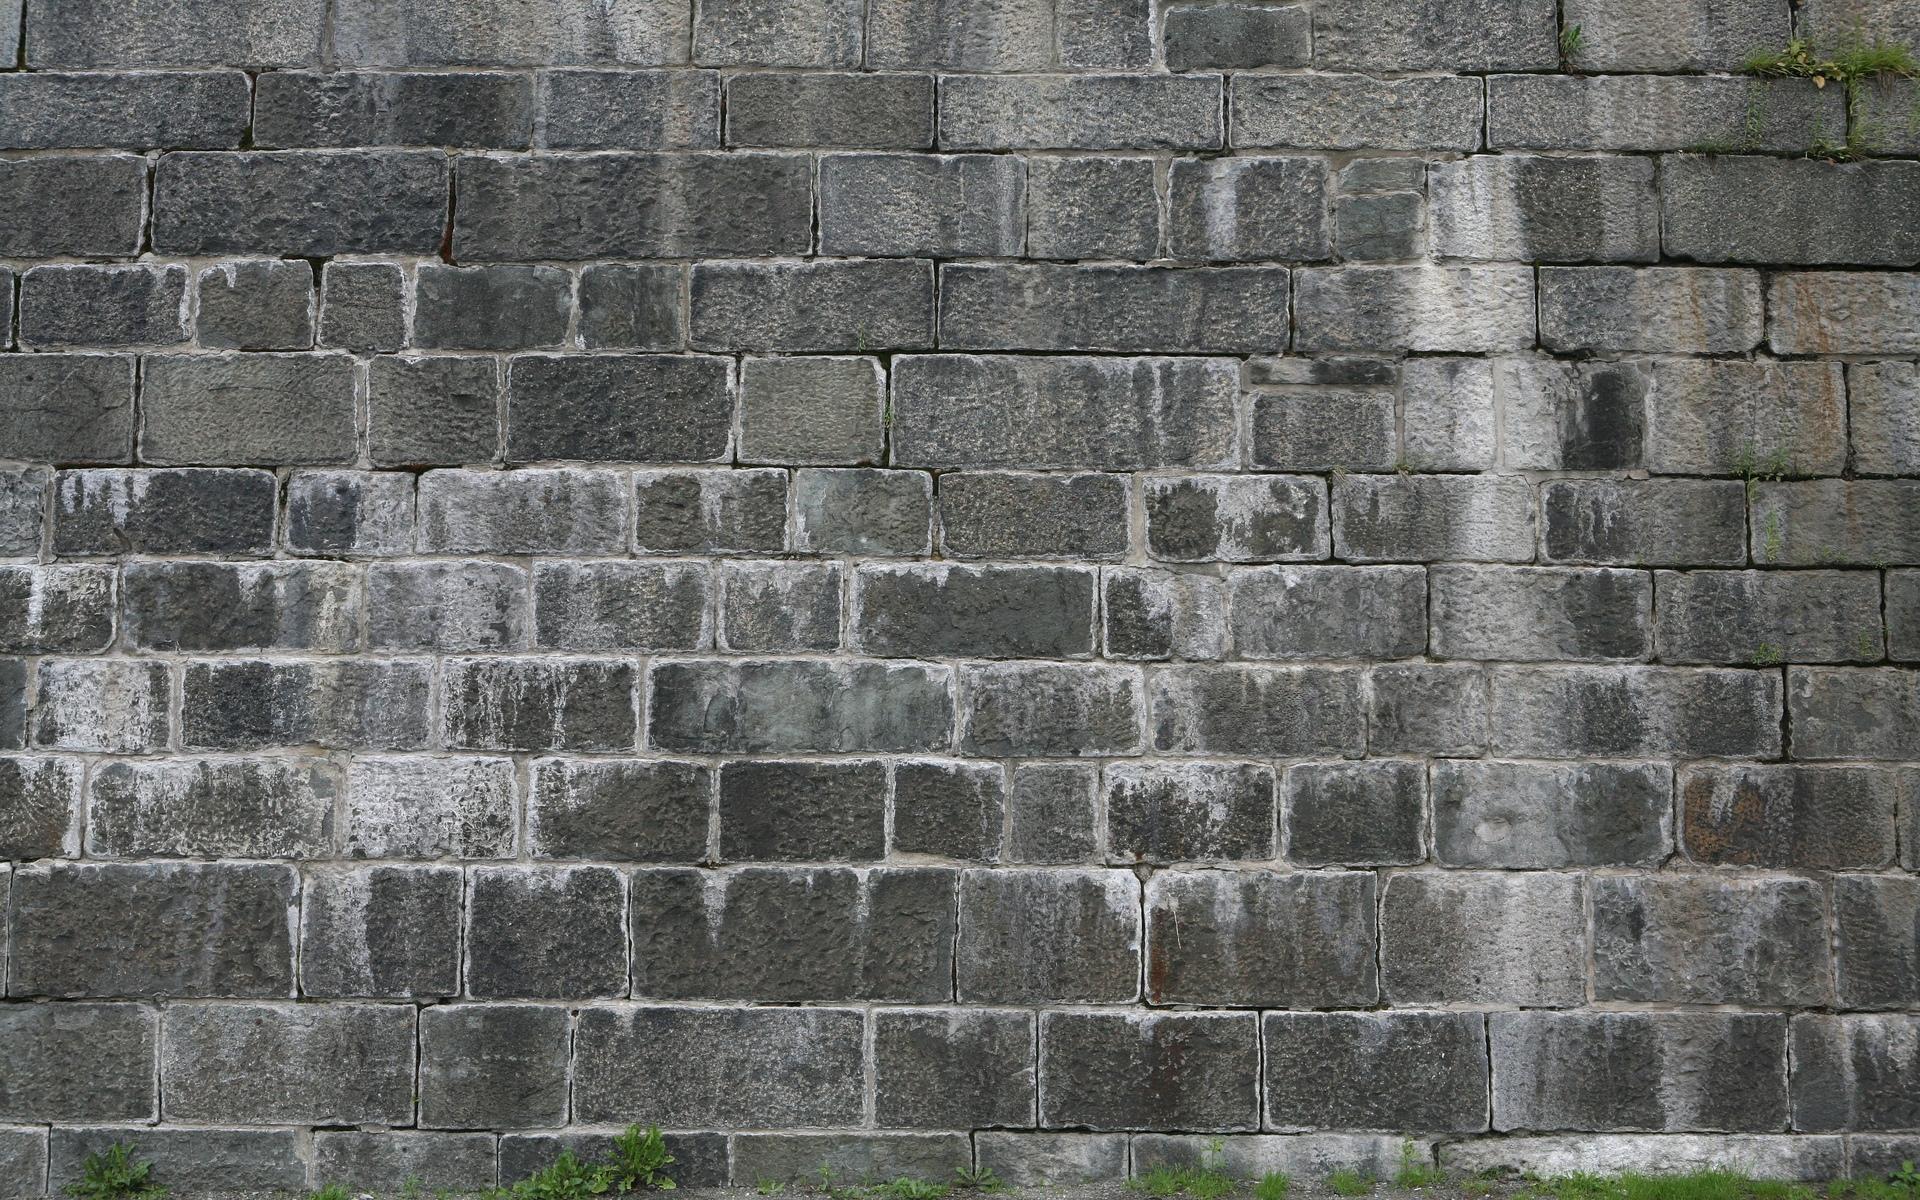 Brick Wall World Wallpaper Collection 1920x1200